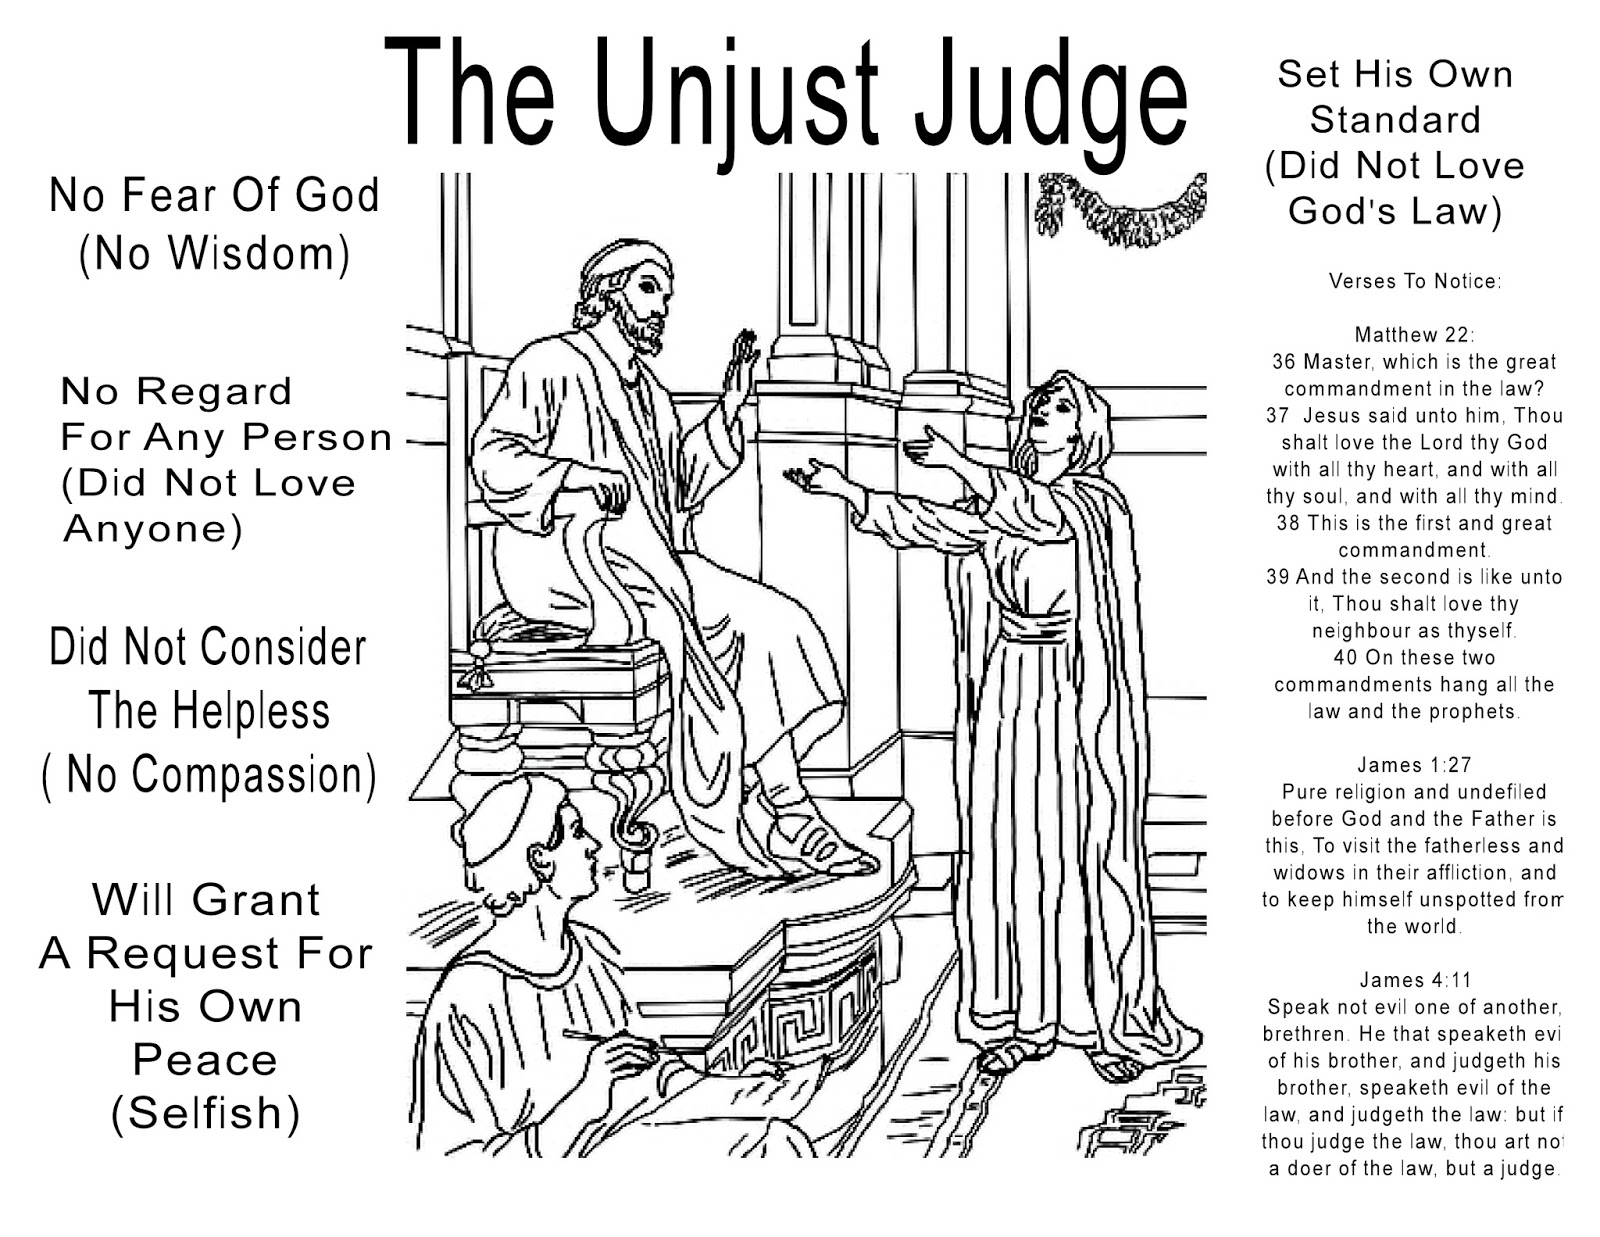 Children's Gems In My Treasure Box: The Unjust Judge